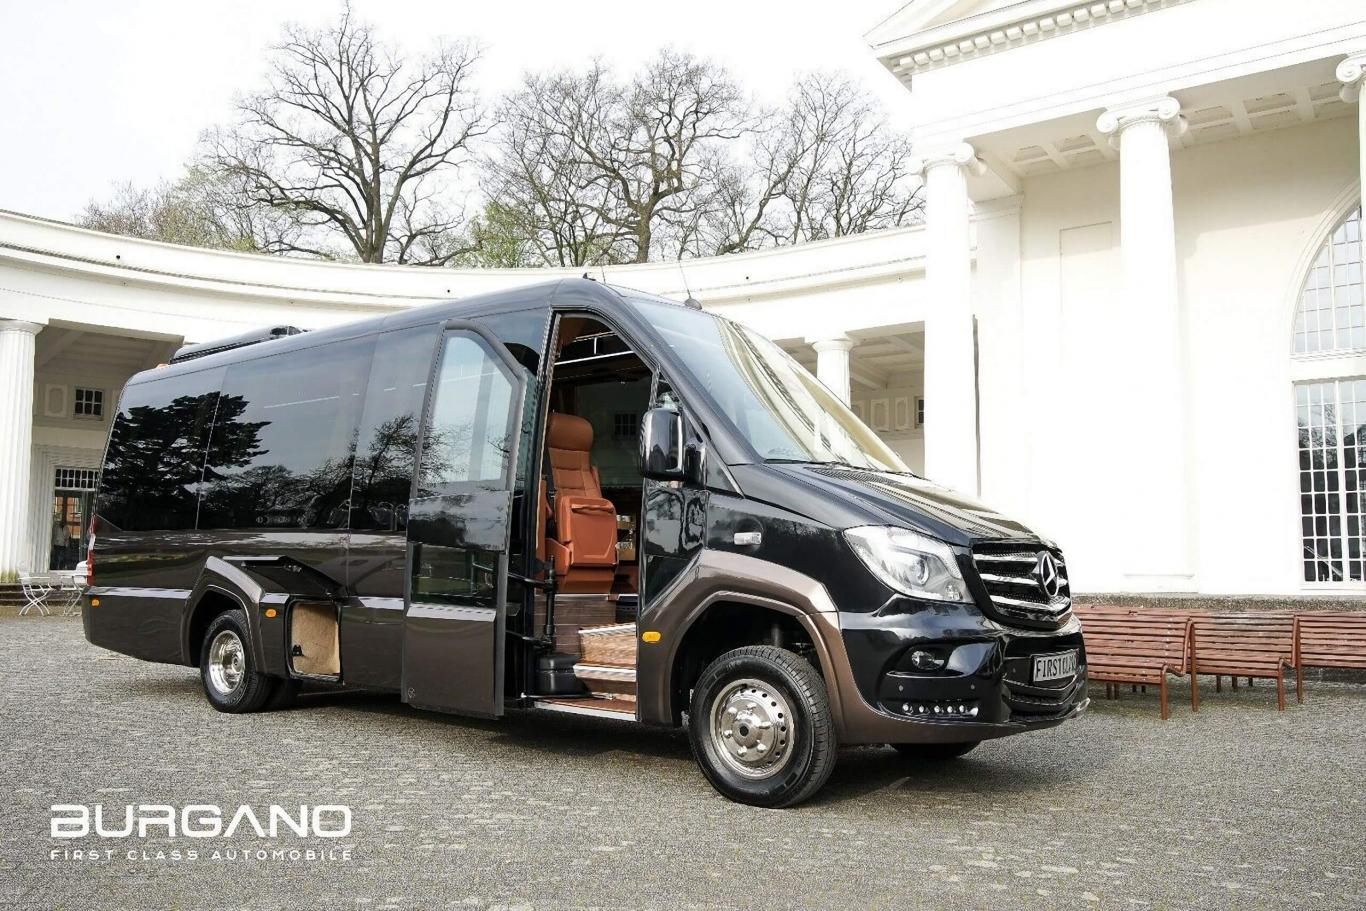 Mercedes Sprinter 4X4 >> Mercedes Benz Sprinter 519 4x4 Luxury First Class Van 319 Vip